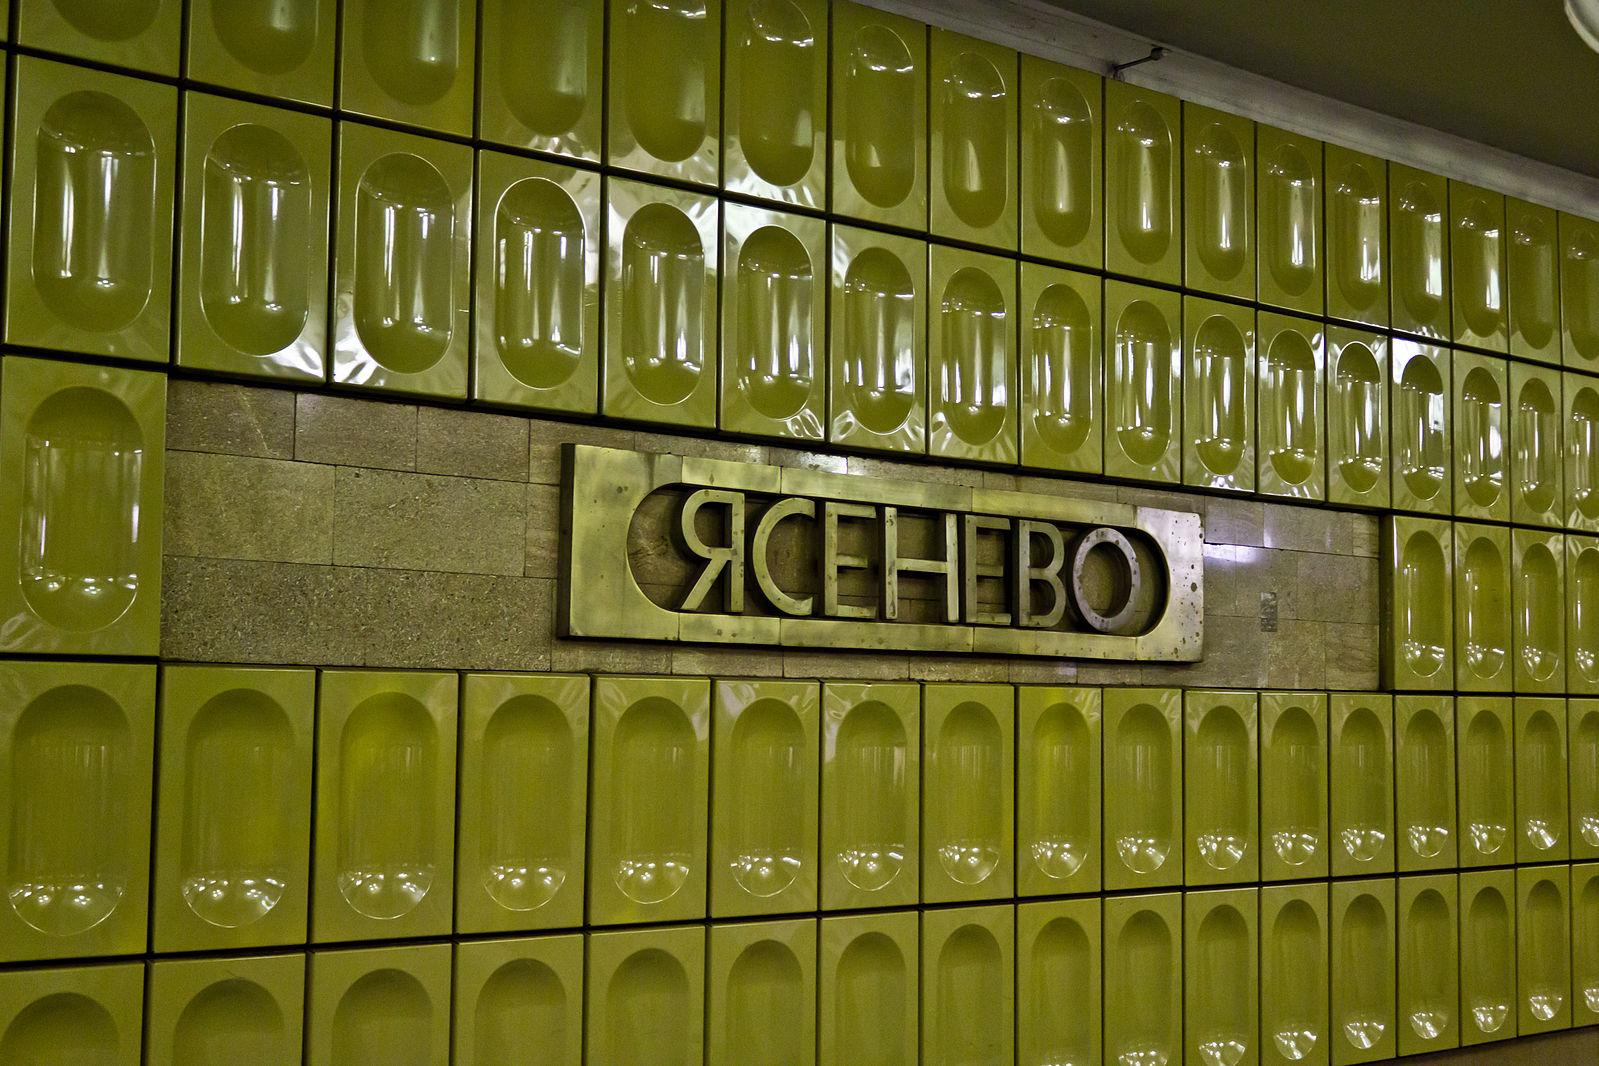 Жители района отметили 30-летний юбилей станции Московского метрополитена Калужско-Рижской линии «Ясенево»